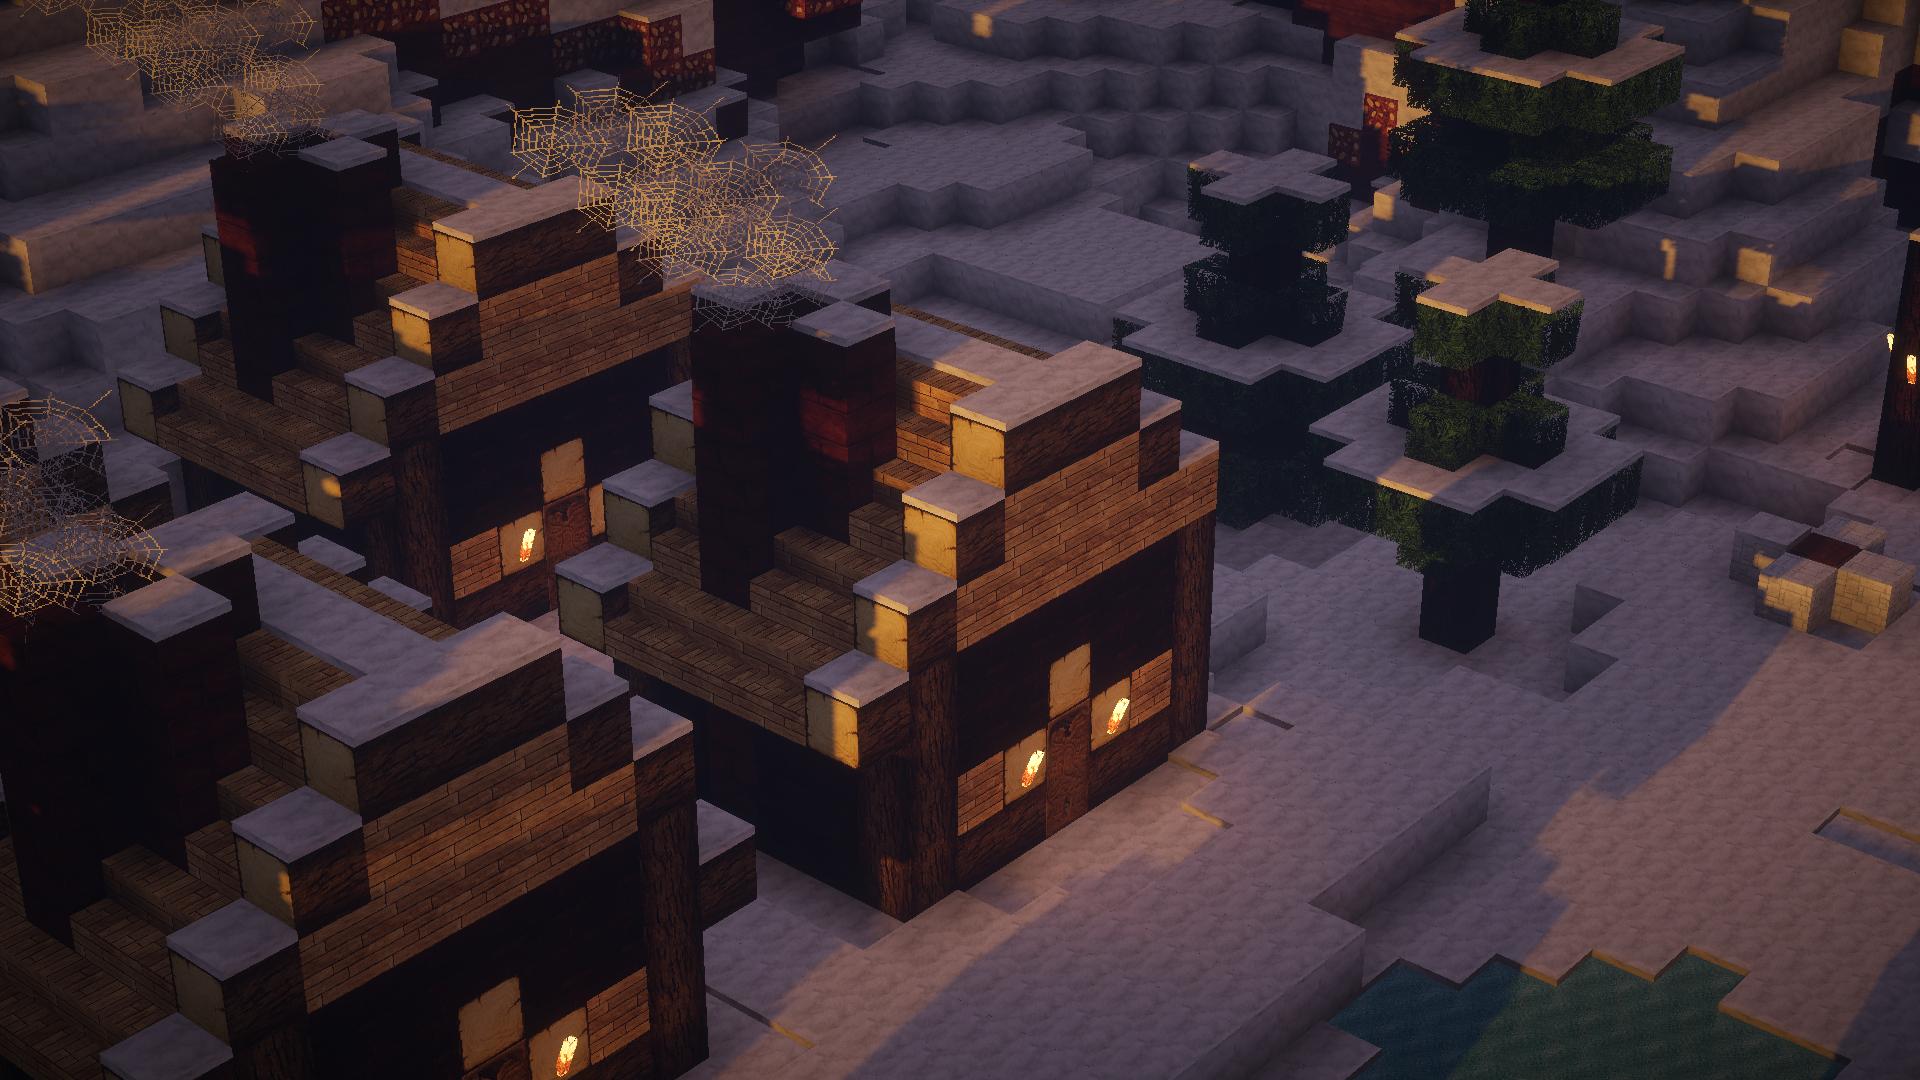 Christmas-An-Awakening-Adventure-Map-5.jpg